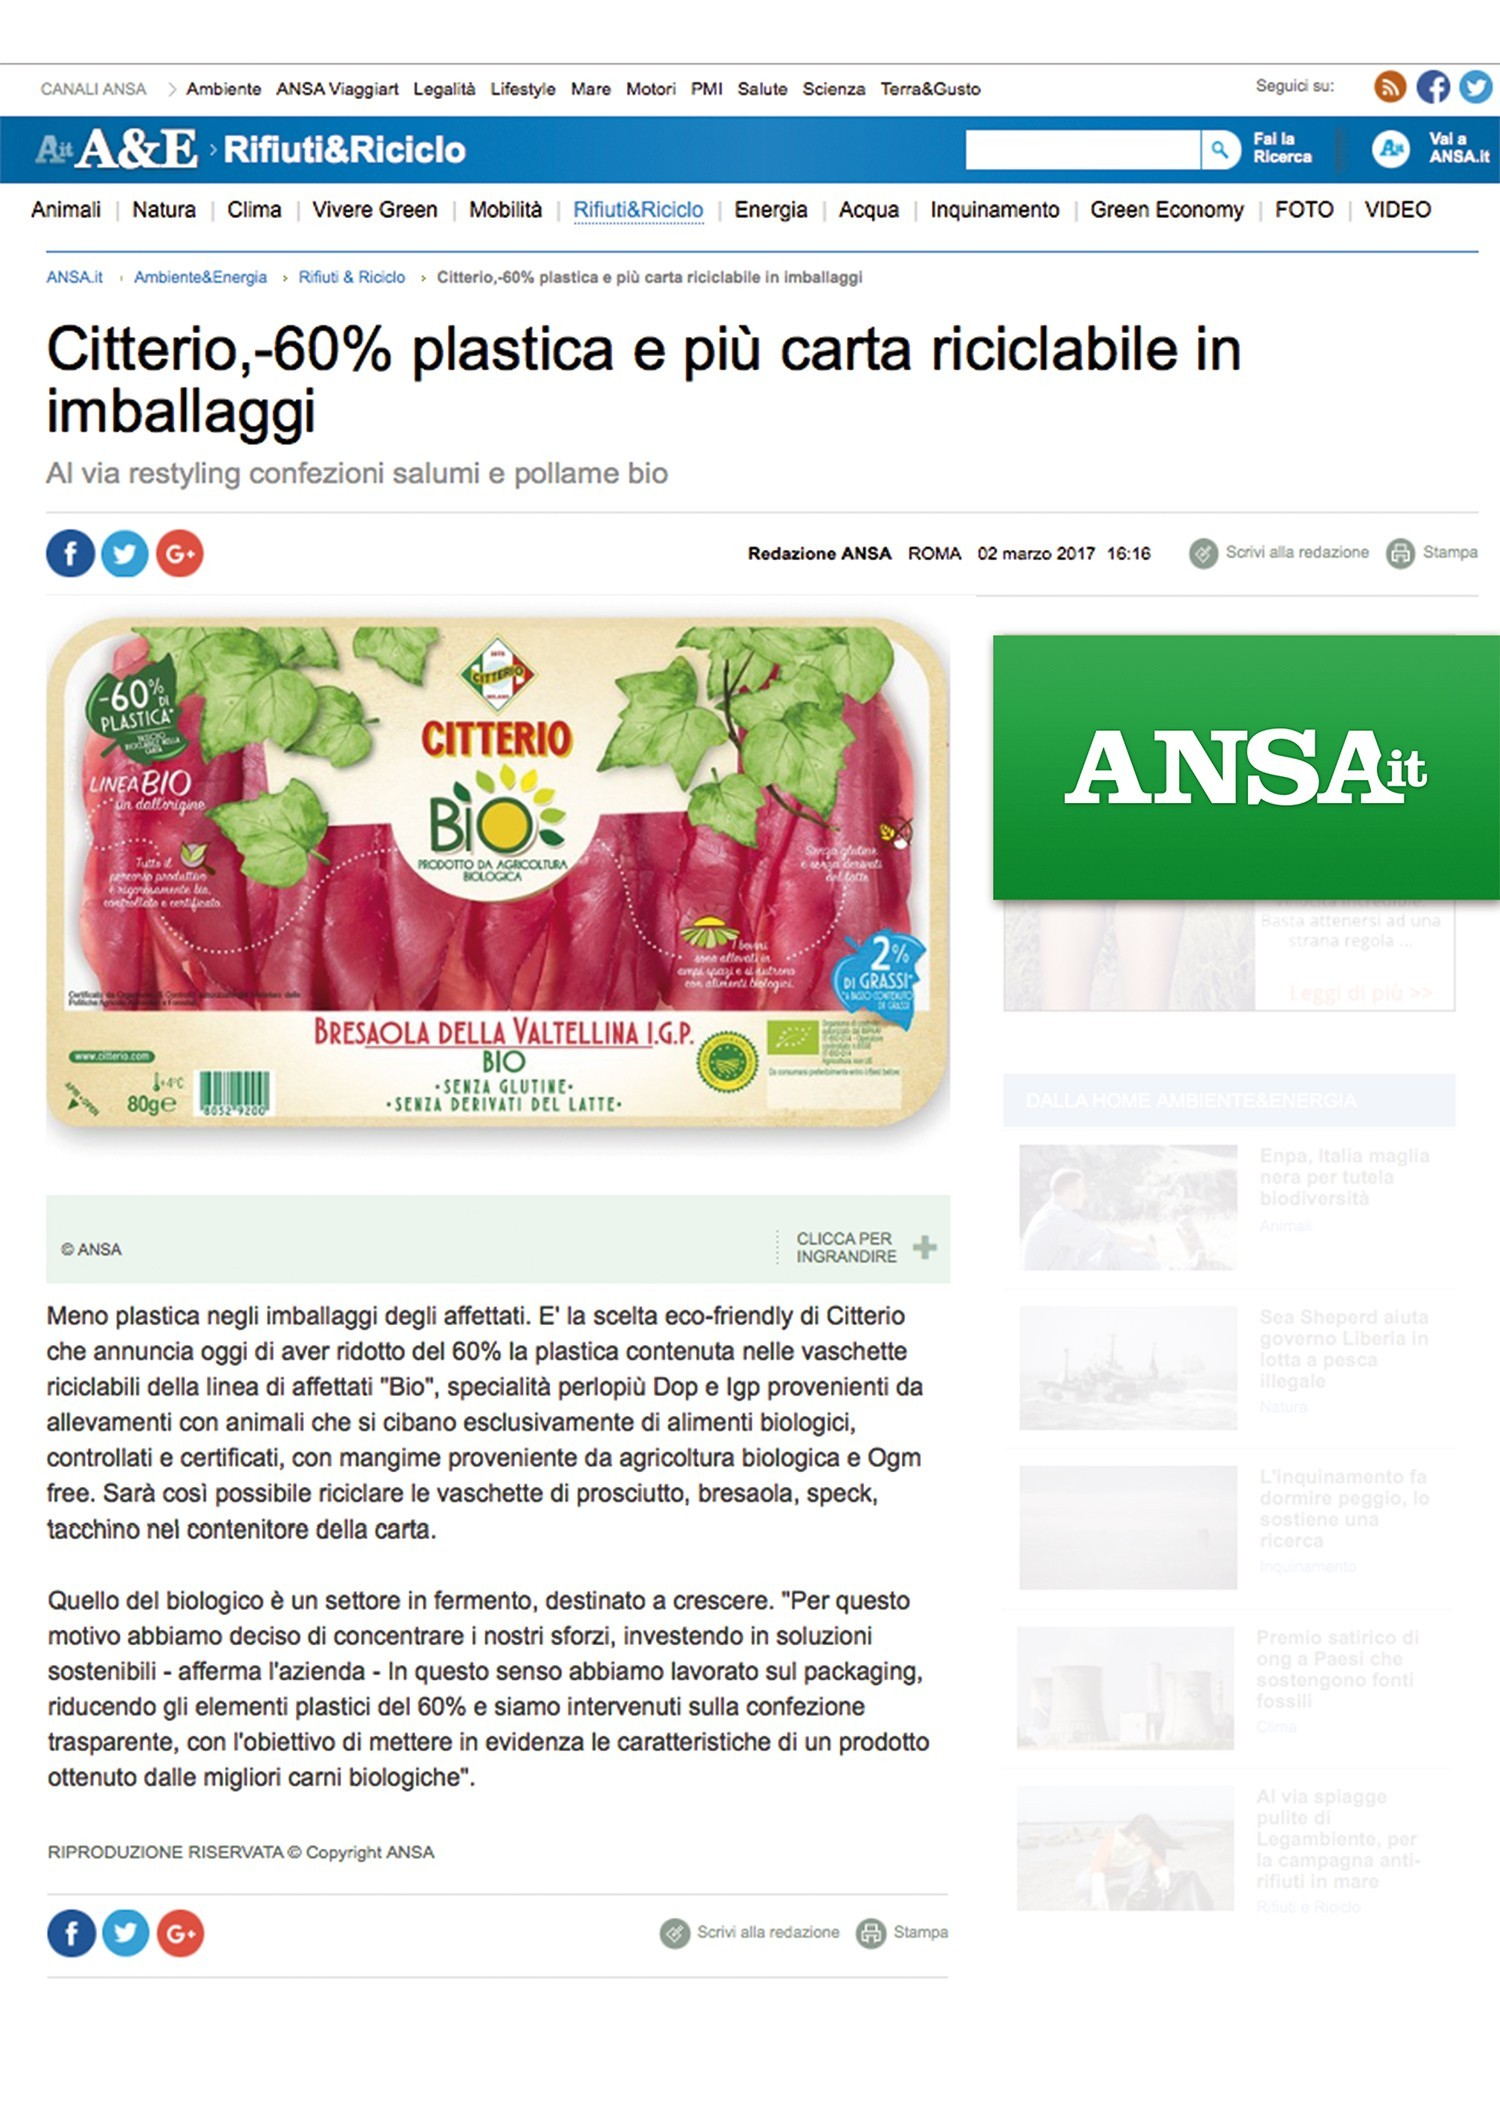 CITTERIO BIO SULL'ANSA